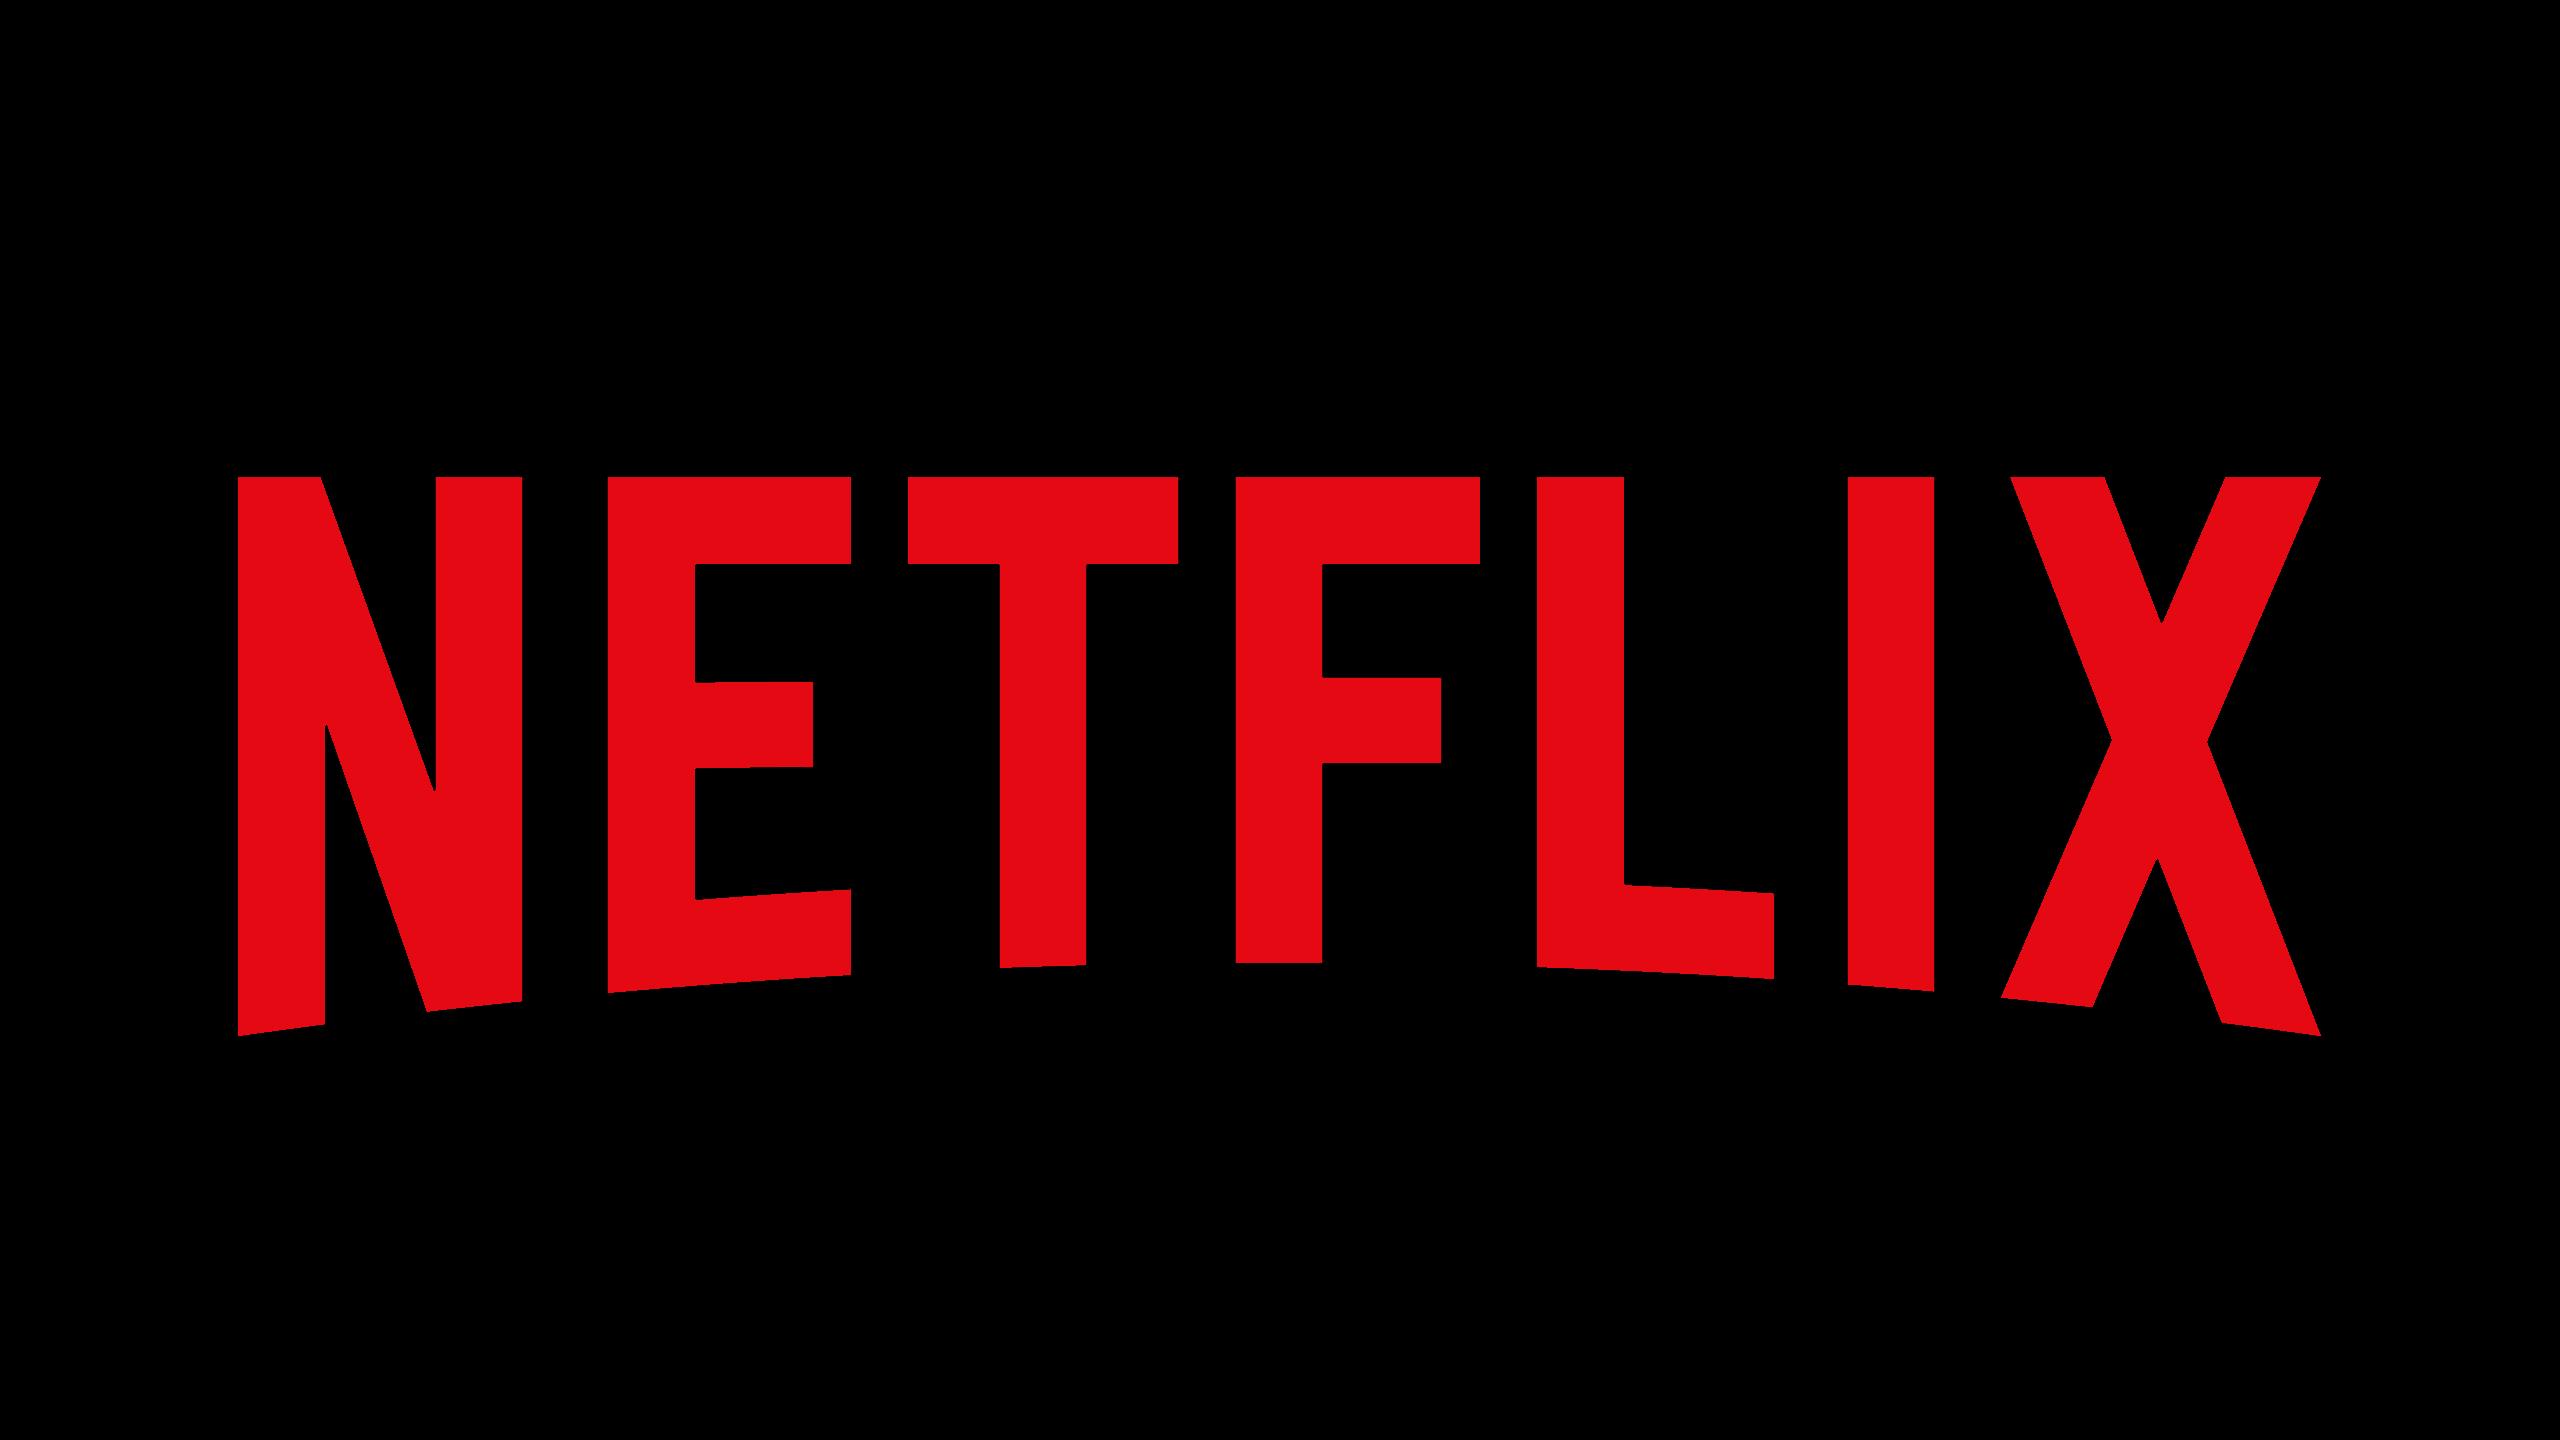 Supports Netflix